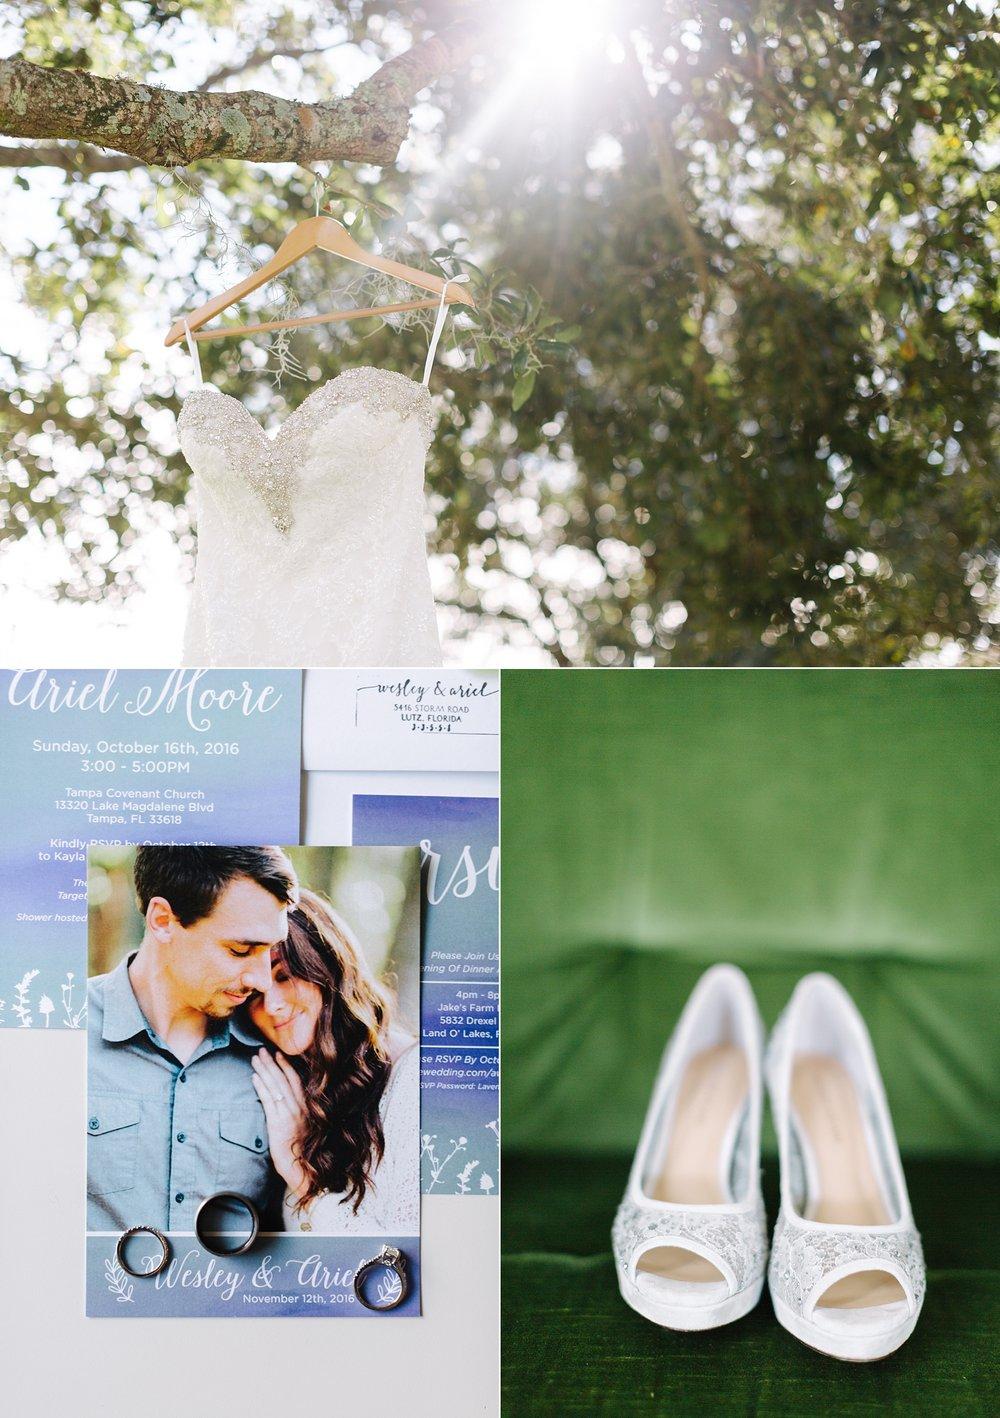 wa wedding blog-8.jpg